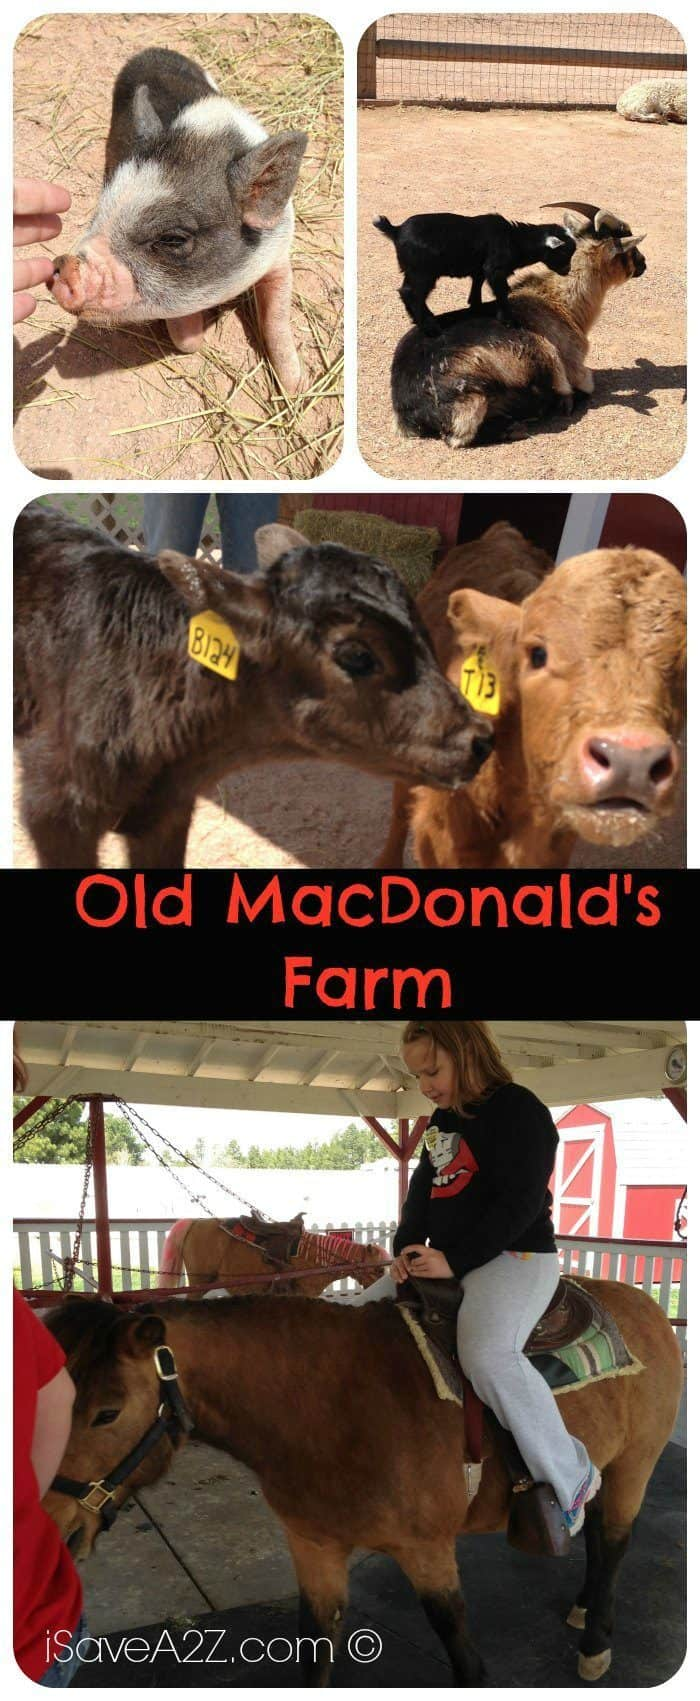 Old MacDonald's Farm in Rapid City, South Dakota